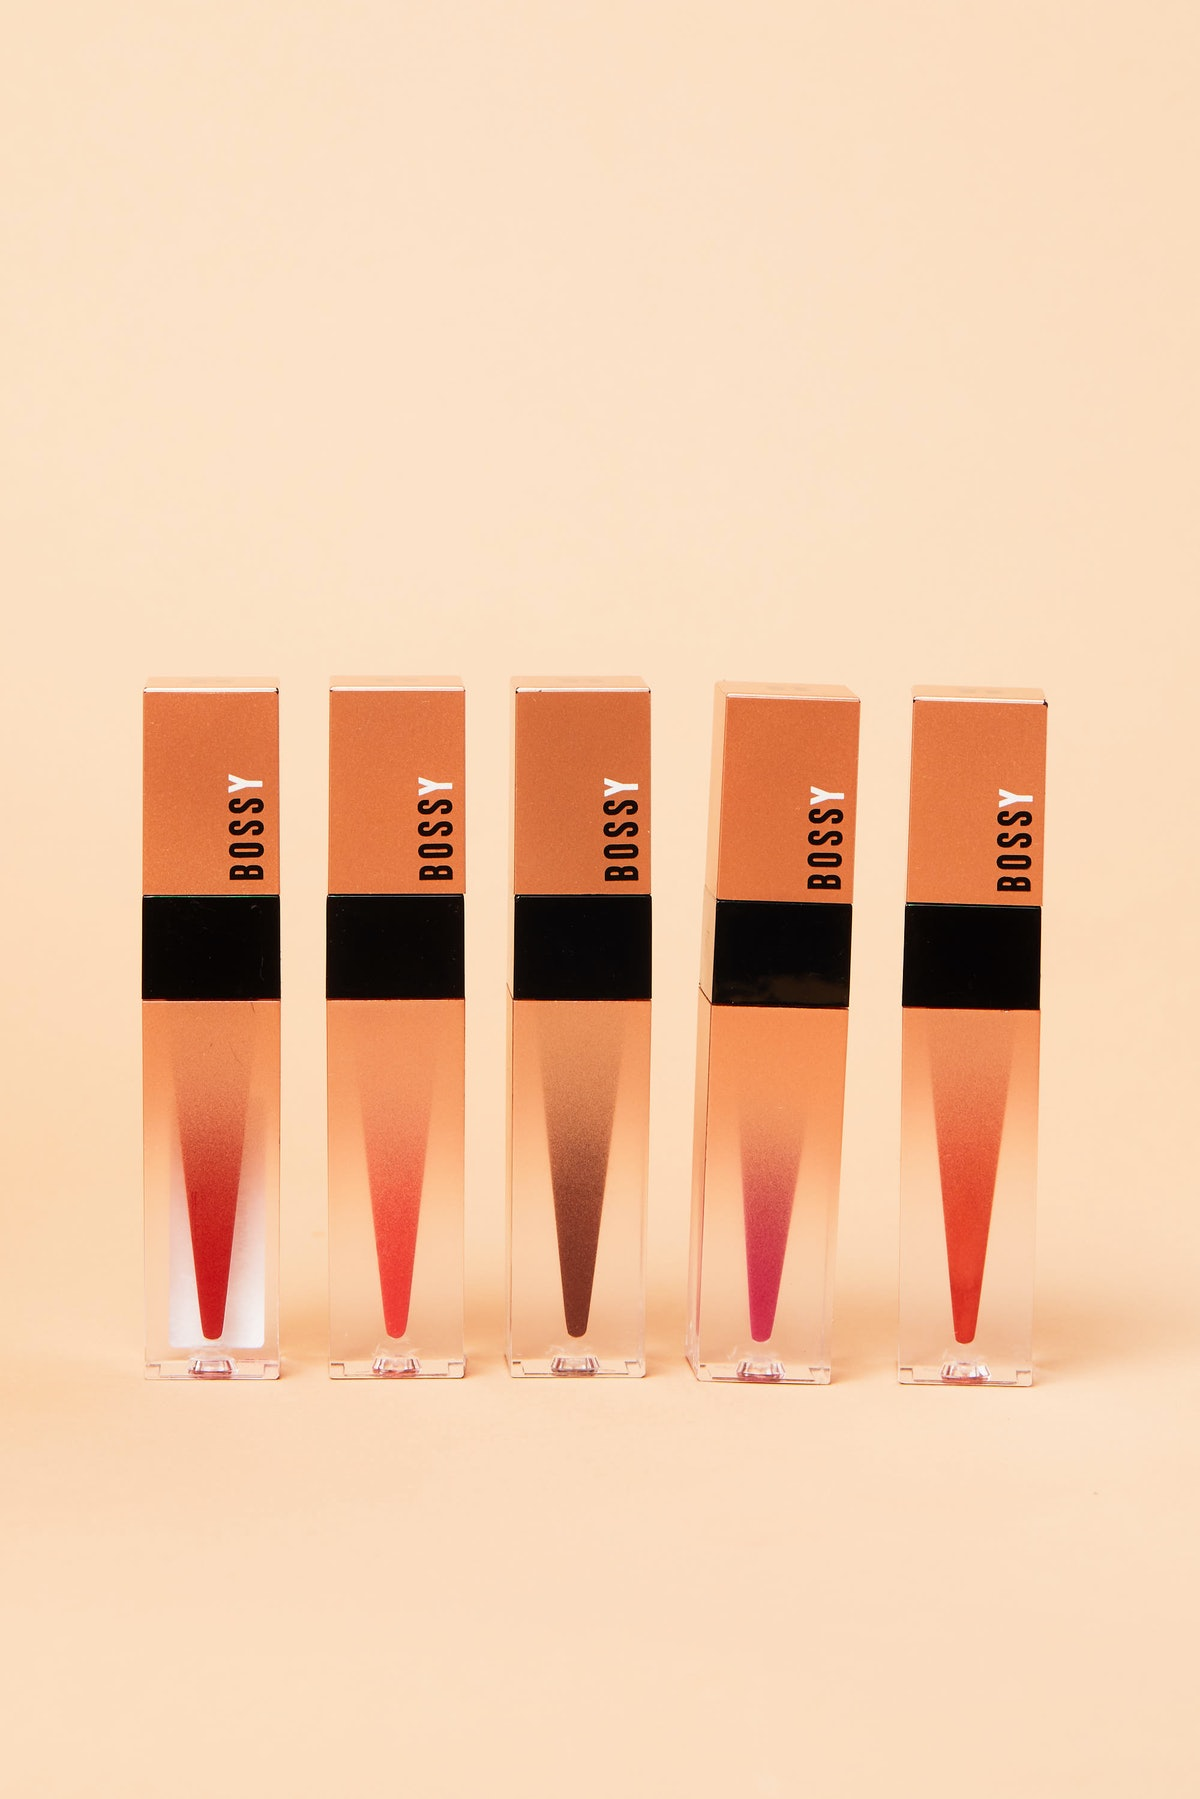 Bossy Cosmetics' Power Woman Essentials Collection has five new liquid lipsticks